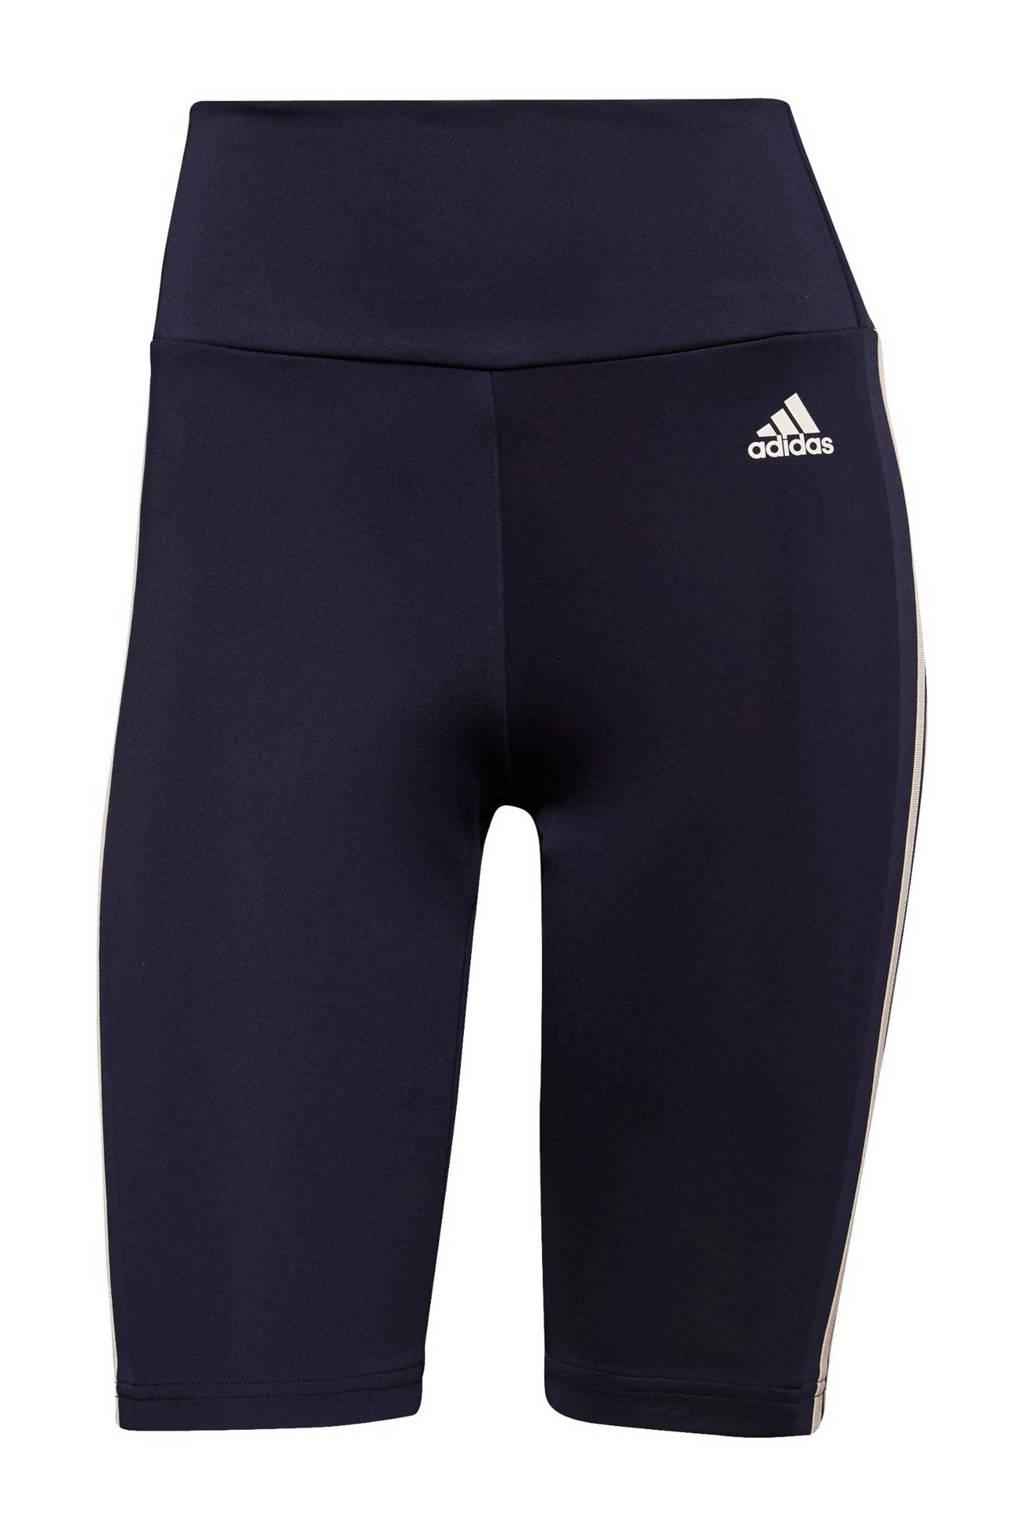 adidas Performance sportshort donkerblauw/wit, Donkerblauw/wit